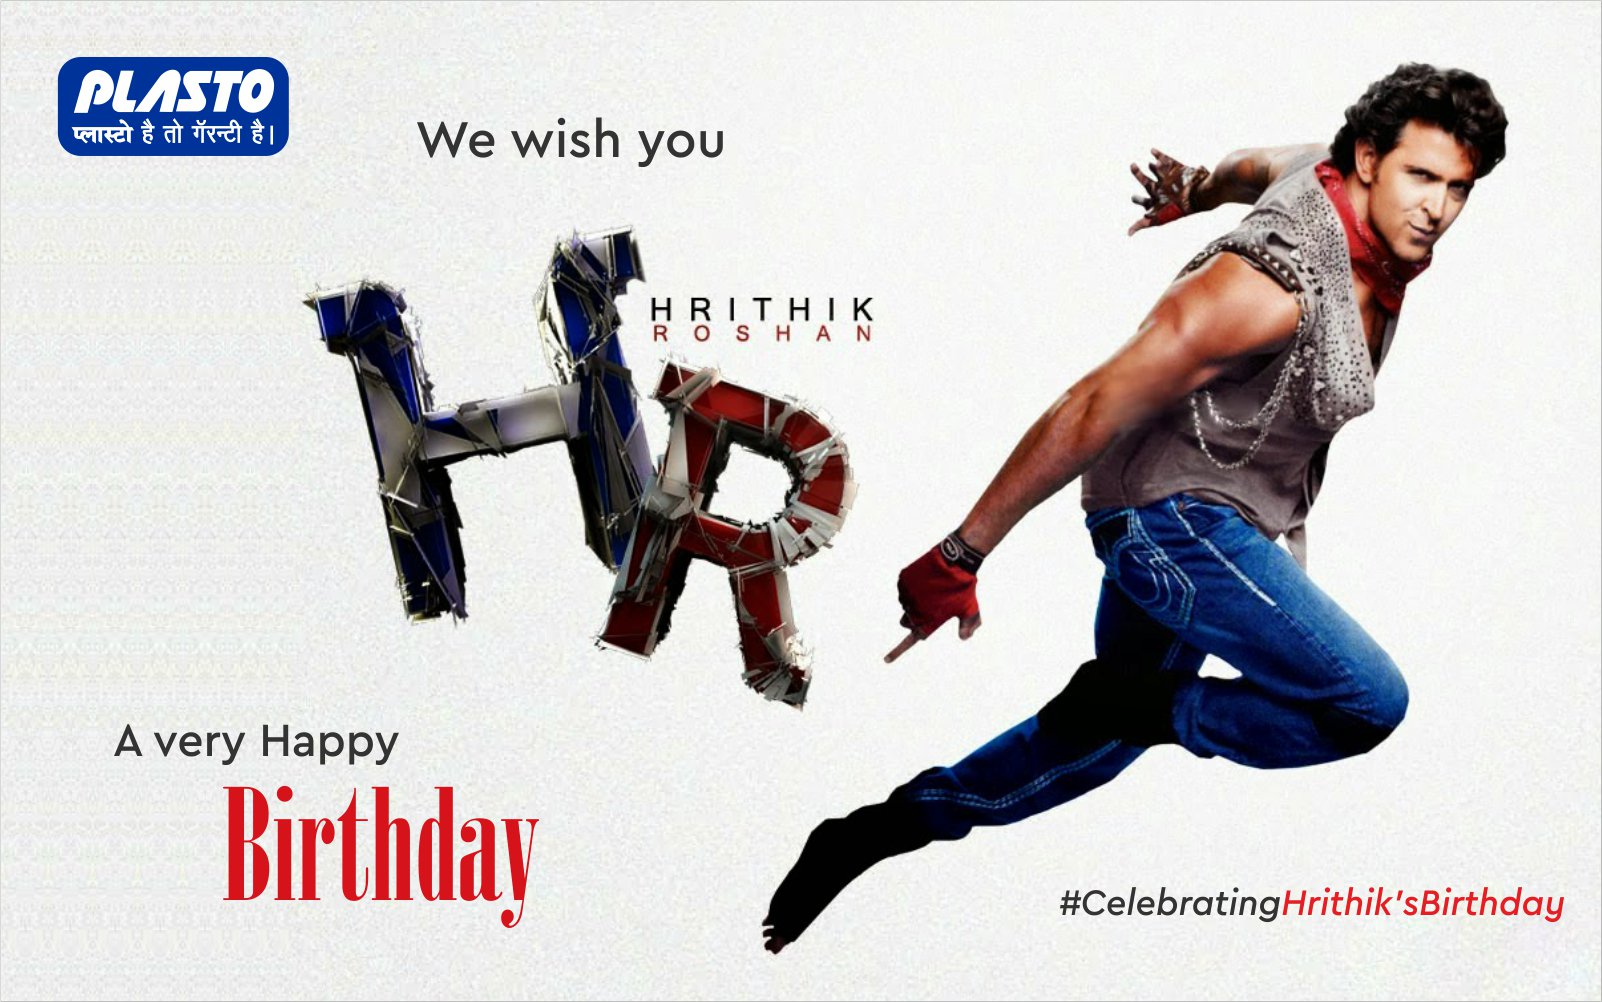 We wish Hrithik Roshan a very Happy Birthday!